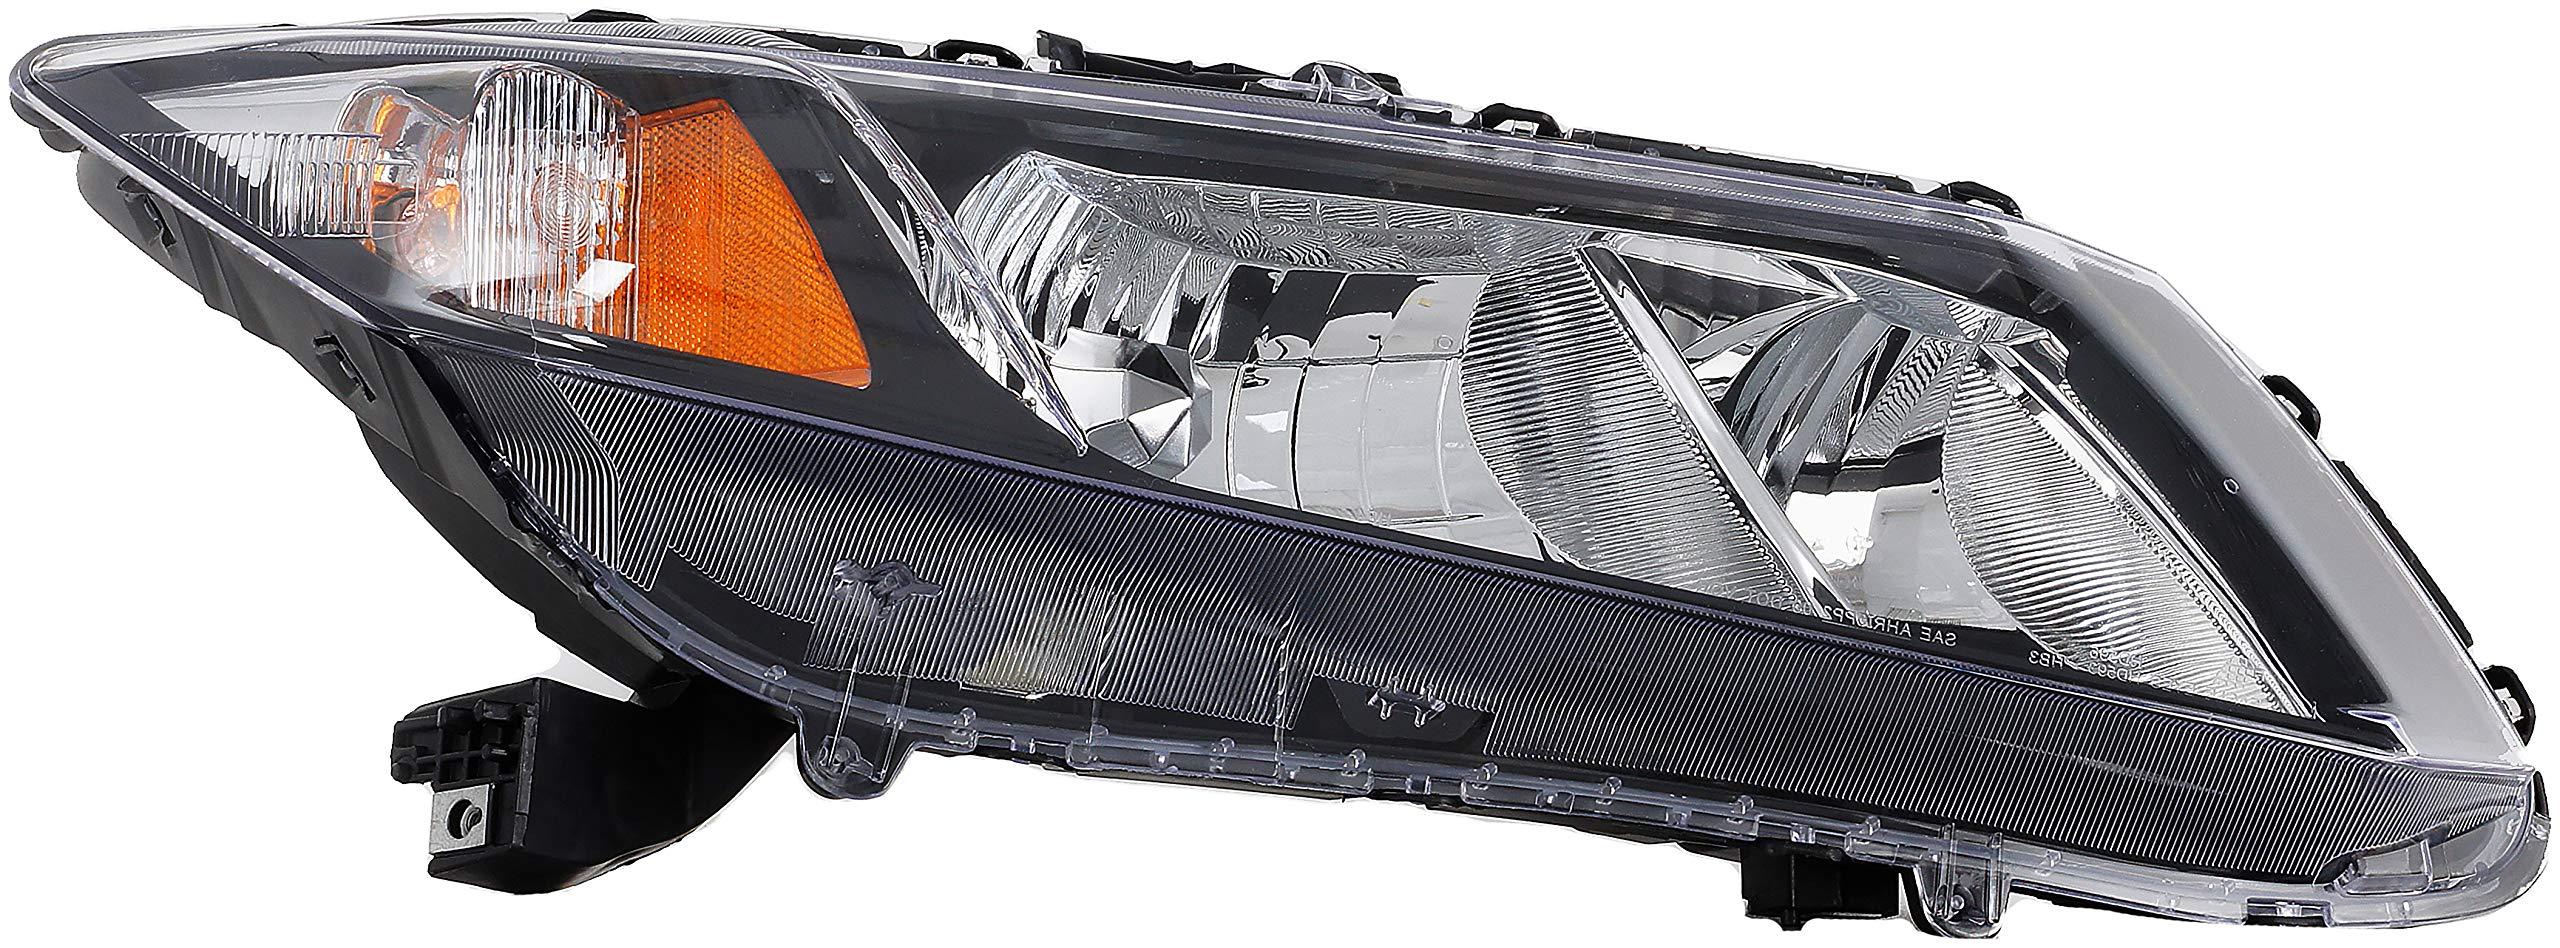 Dorman 1592504 Front Passenger Side Headlamp Assembly for Select Honda Models by Dorman